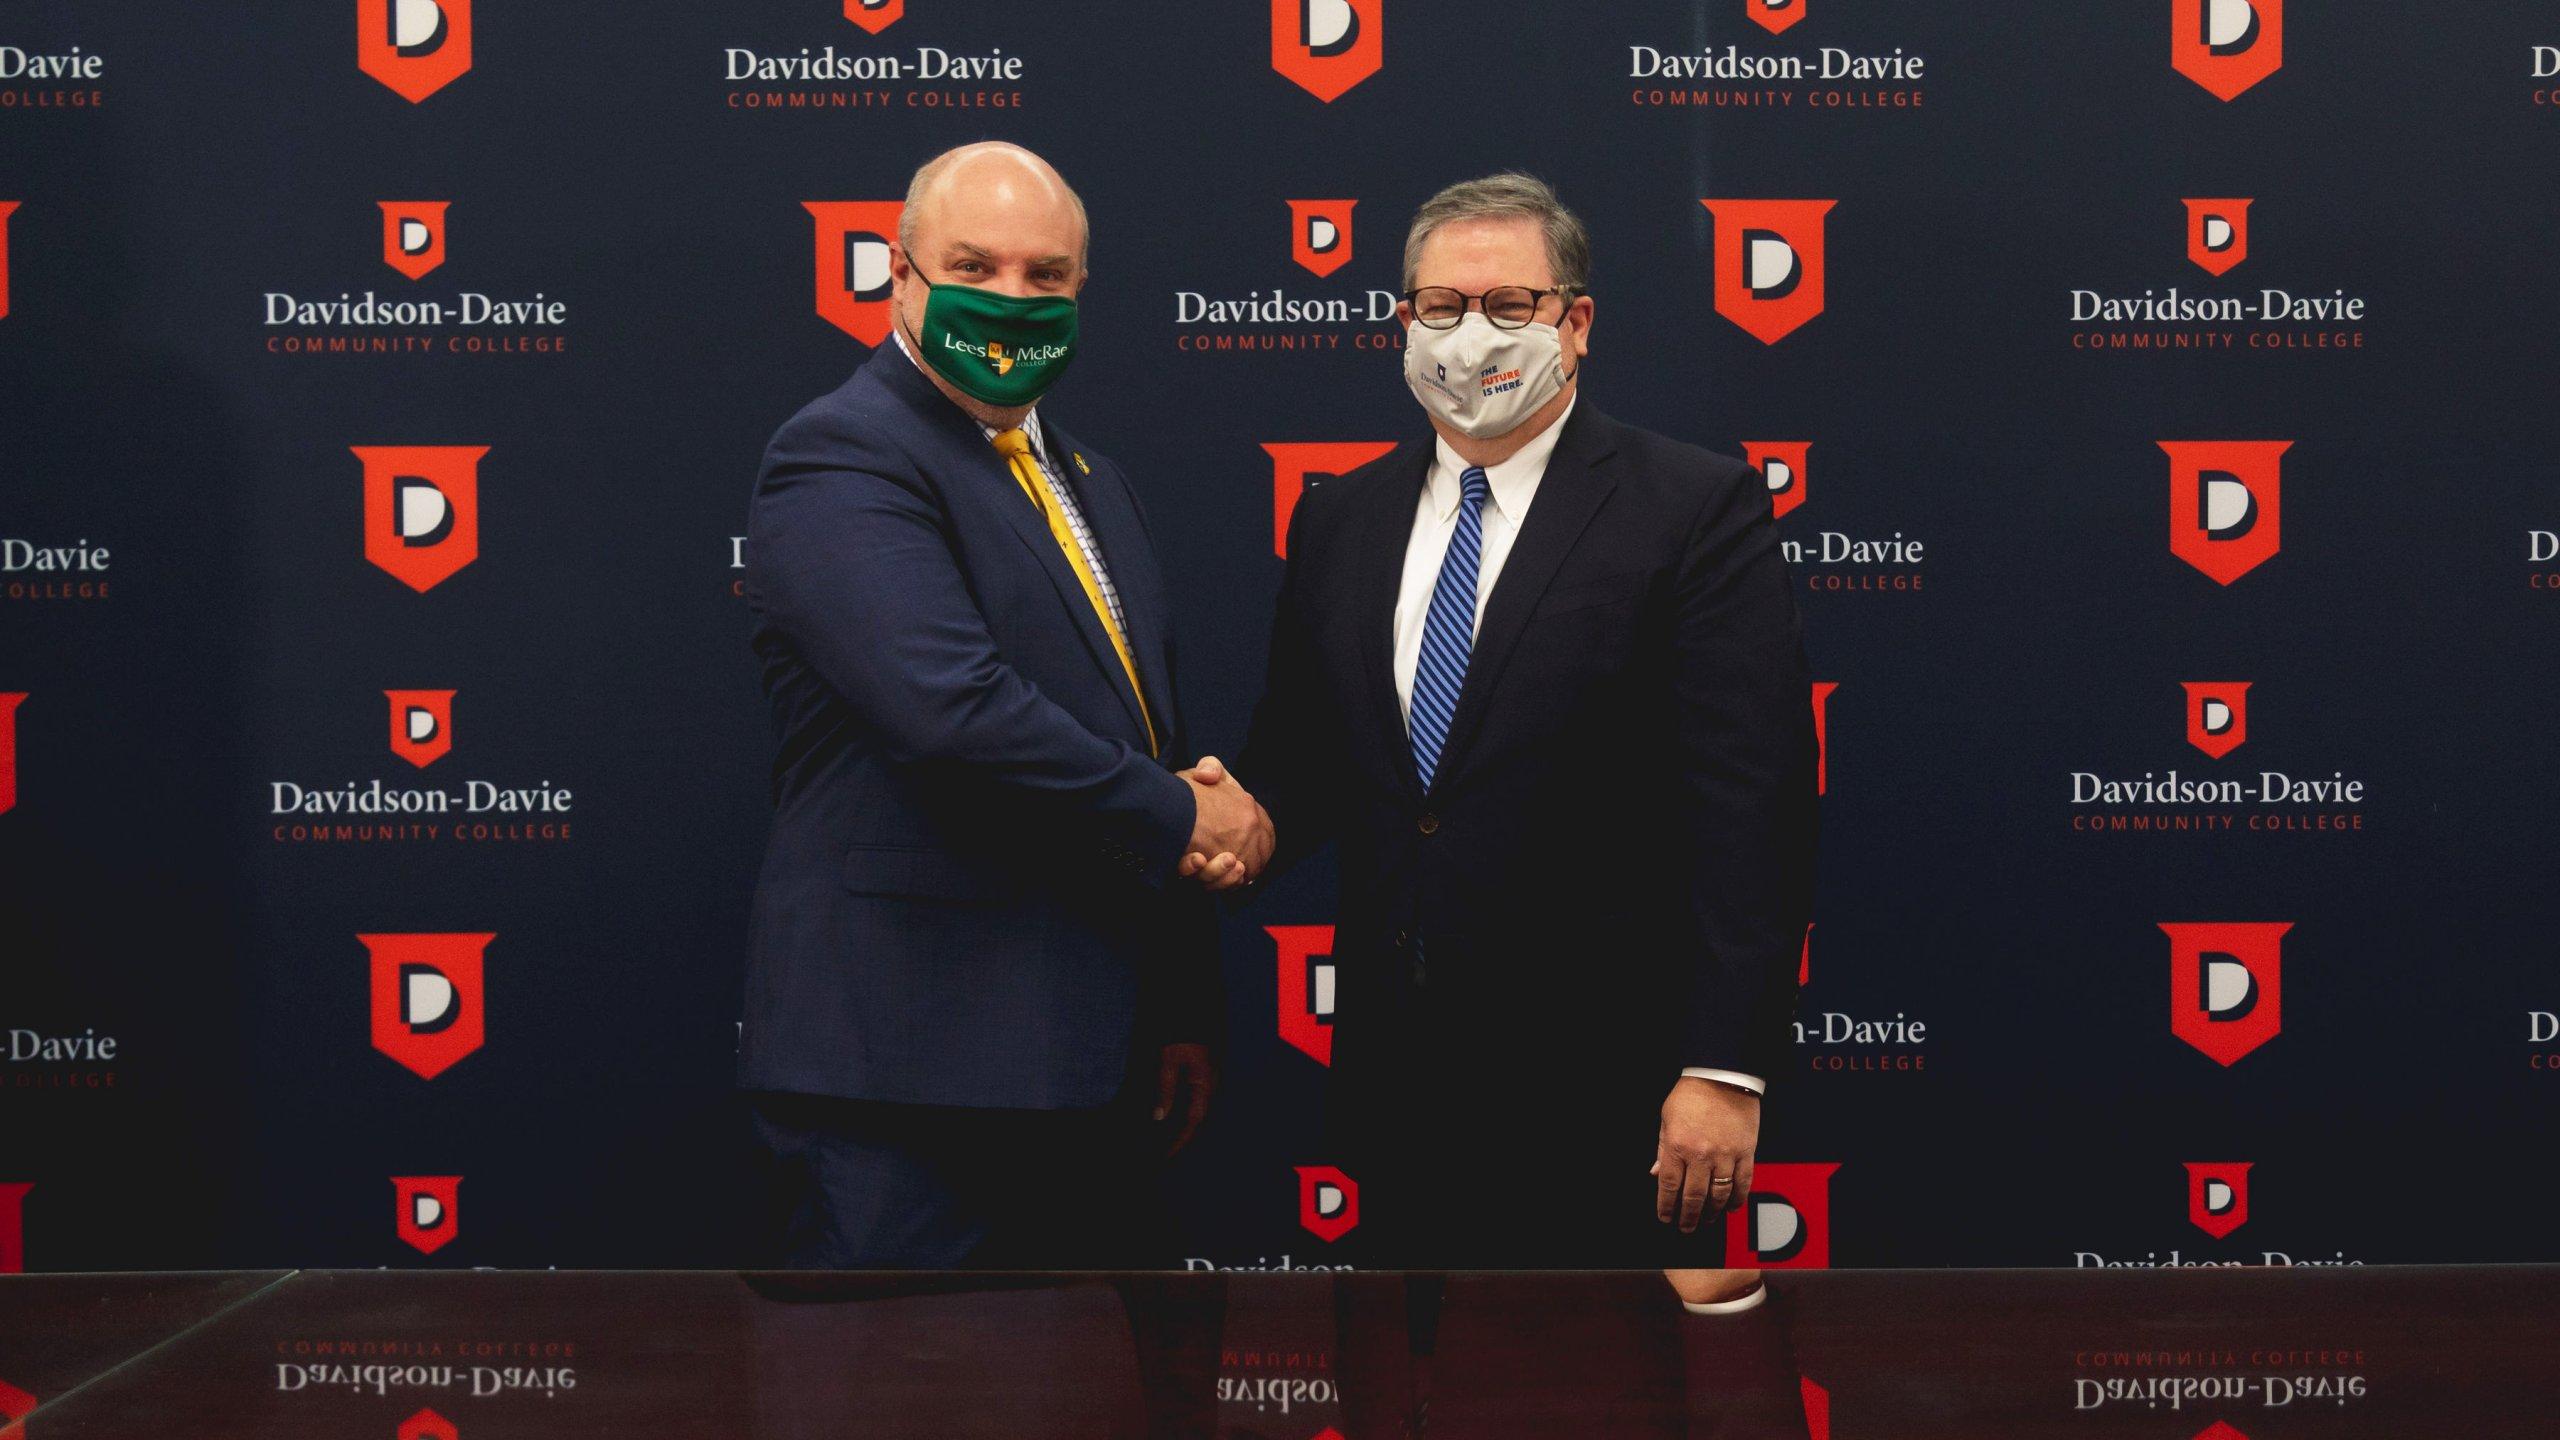 Dr. Hartness & Lees Mcrae representative shaking hands in front of backdrop